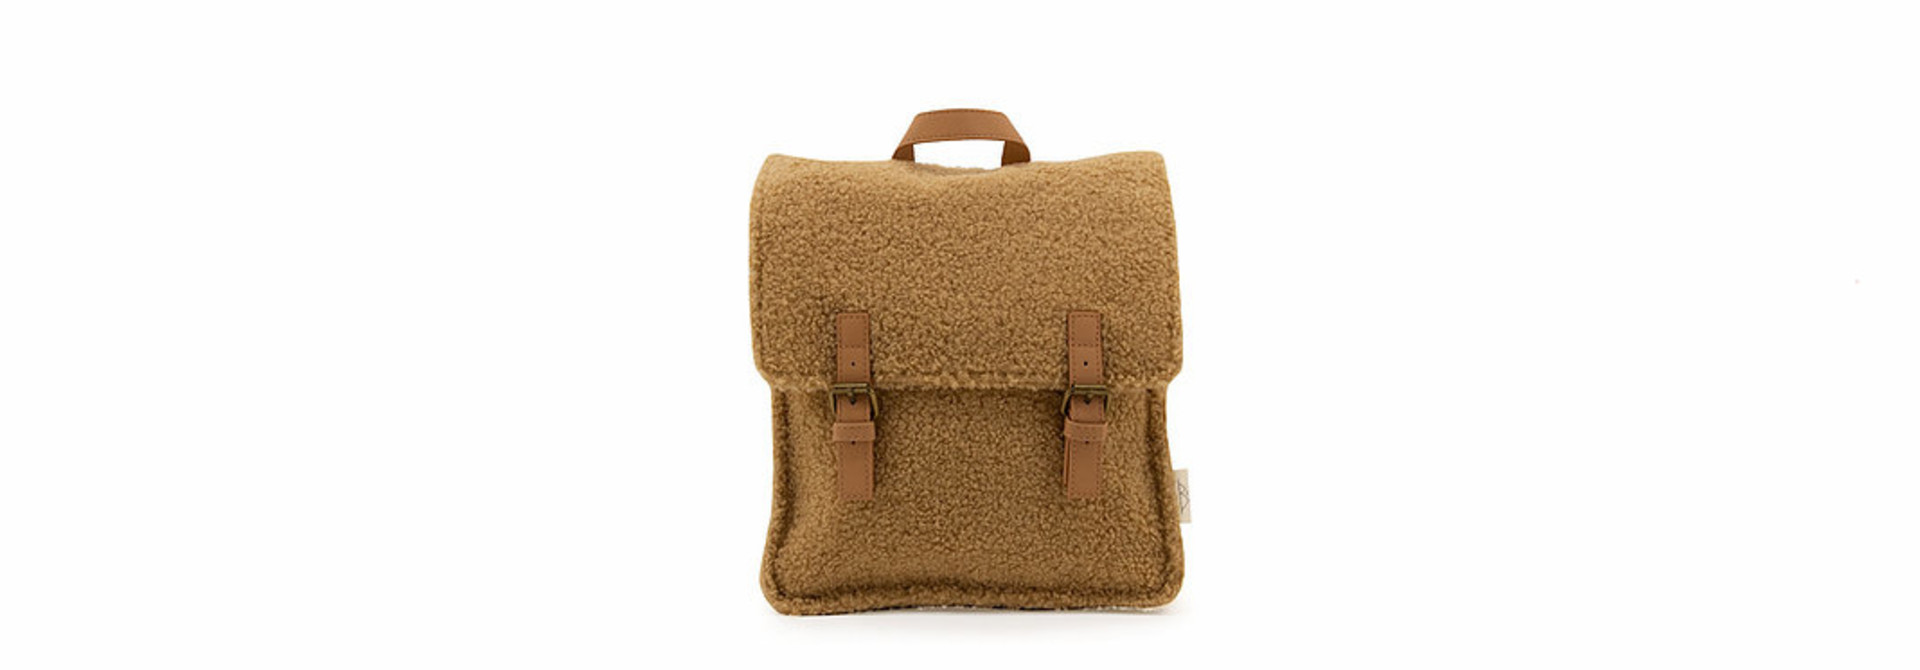 Teddy backpack - sand